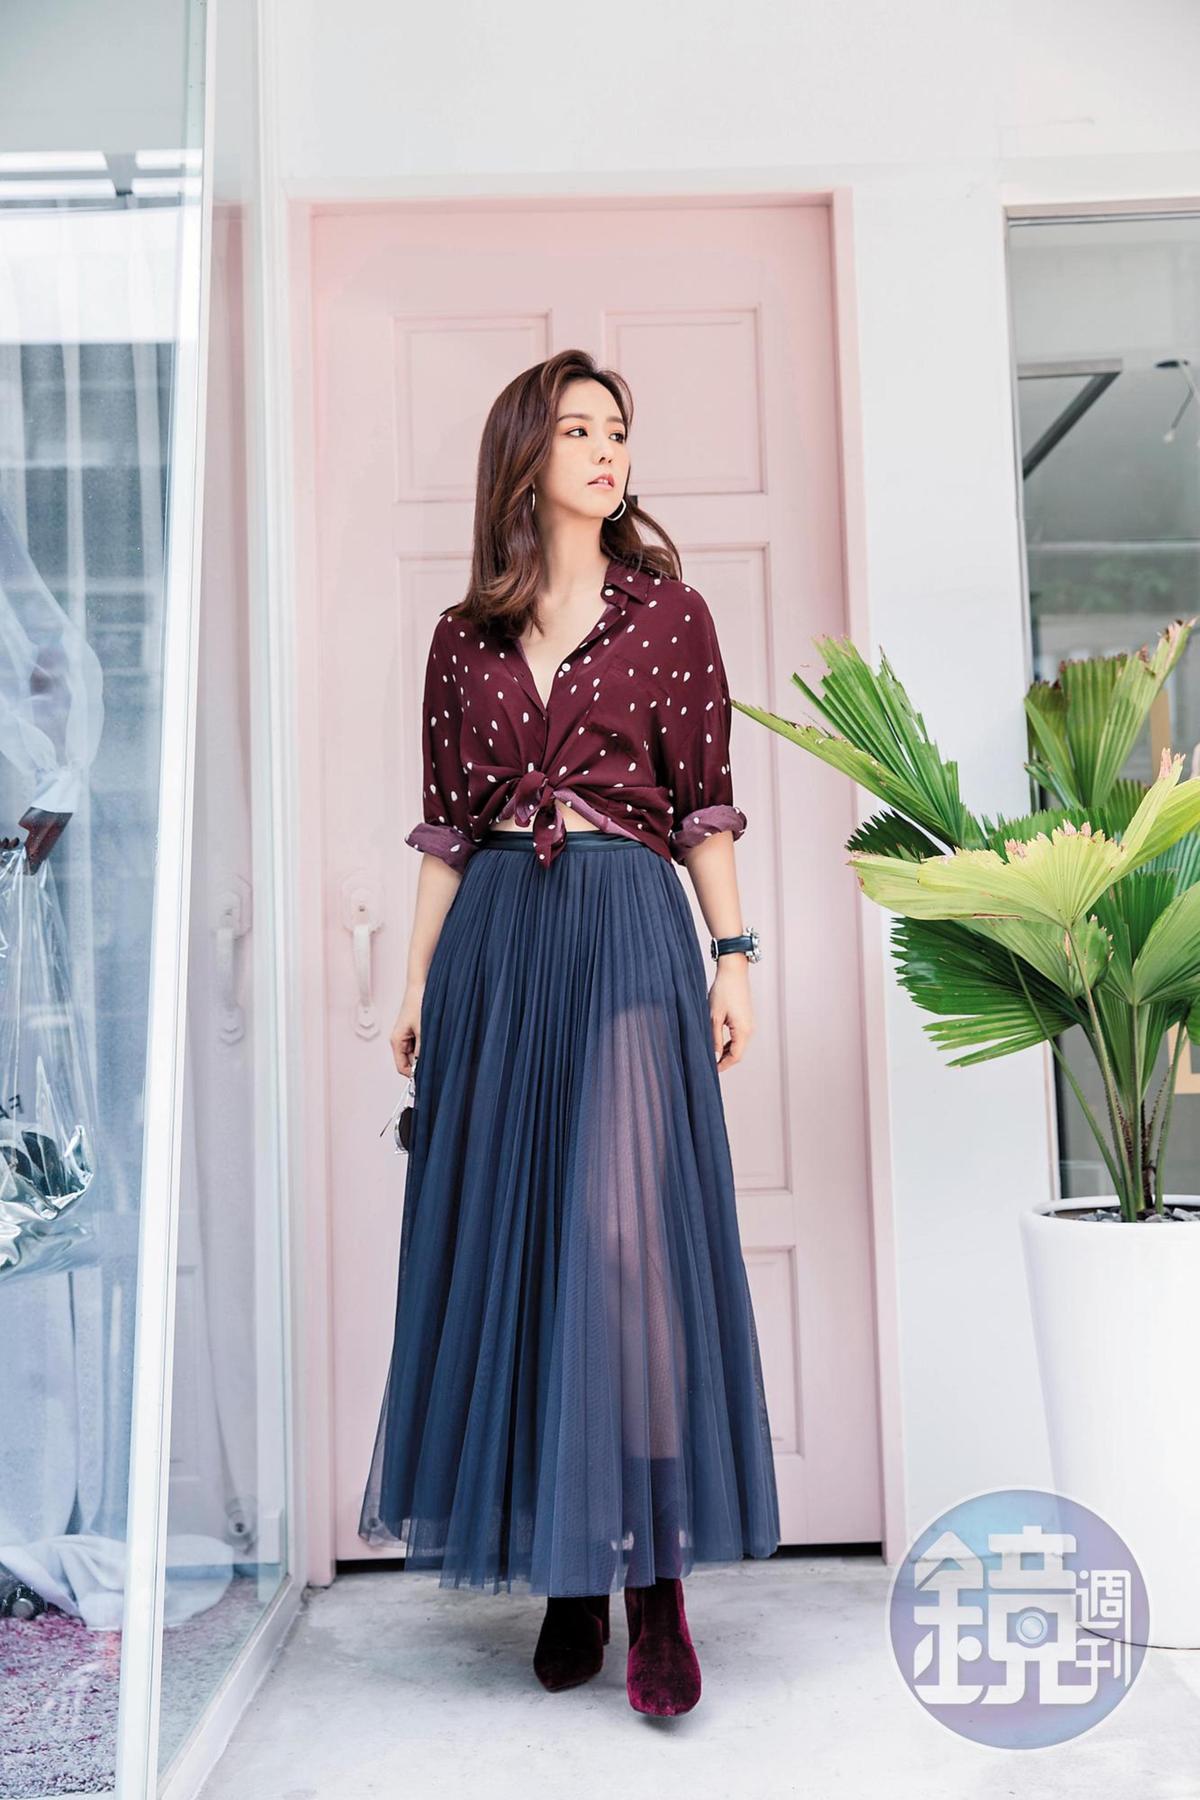 J-Factory紅色襯衫,約NT$1,200;韓國小店買的紗裙,約NT$2,000;ALDO絲絨短靴,NT$3,980。